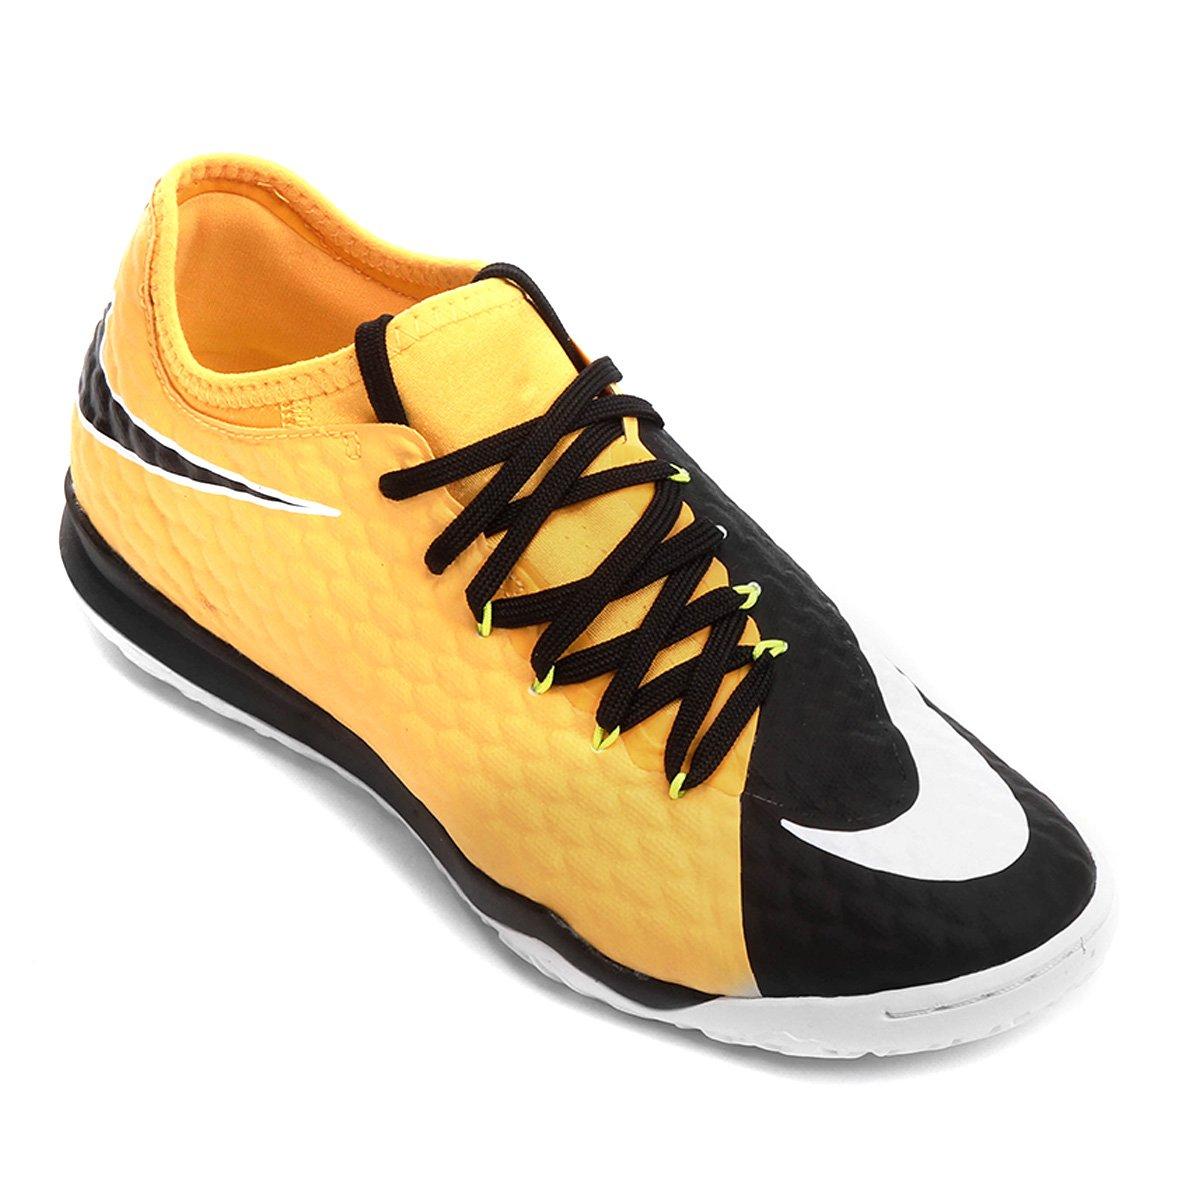 b045cce2caf Chuteira Futsal Nike Hypervenom Finale 2 IC - Compre Agora